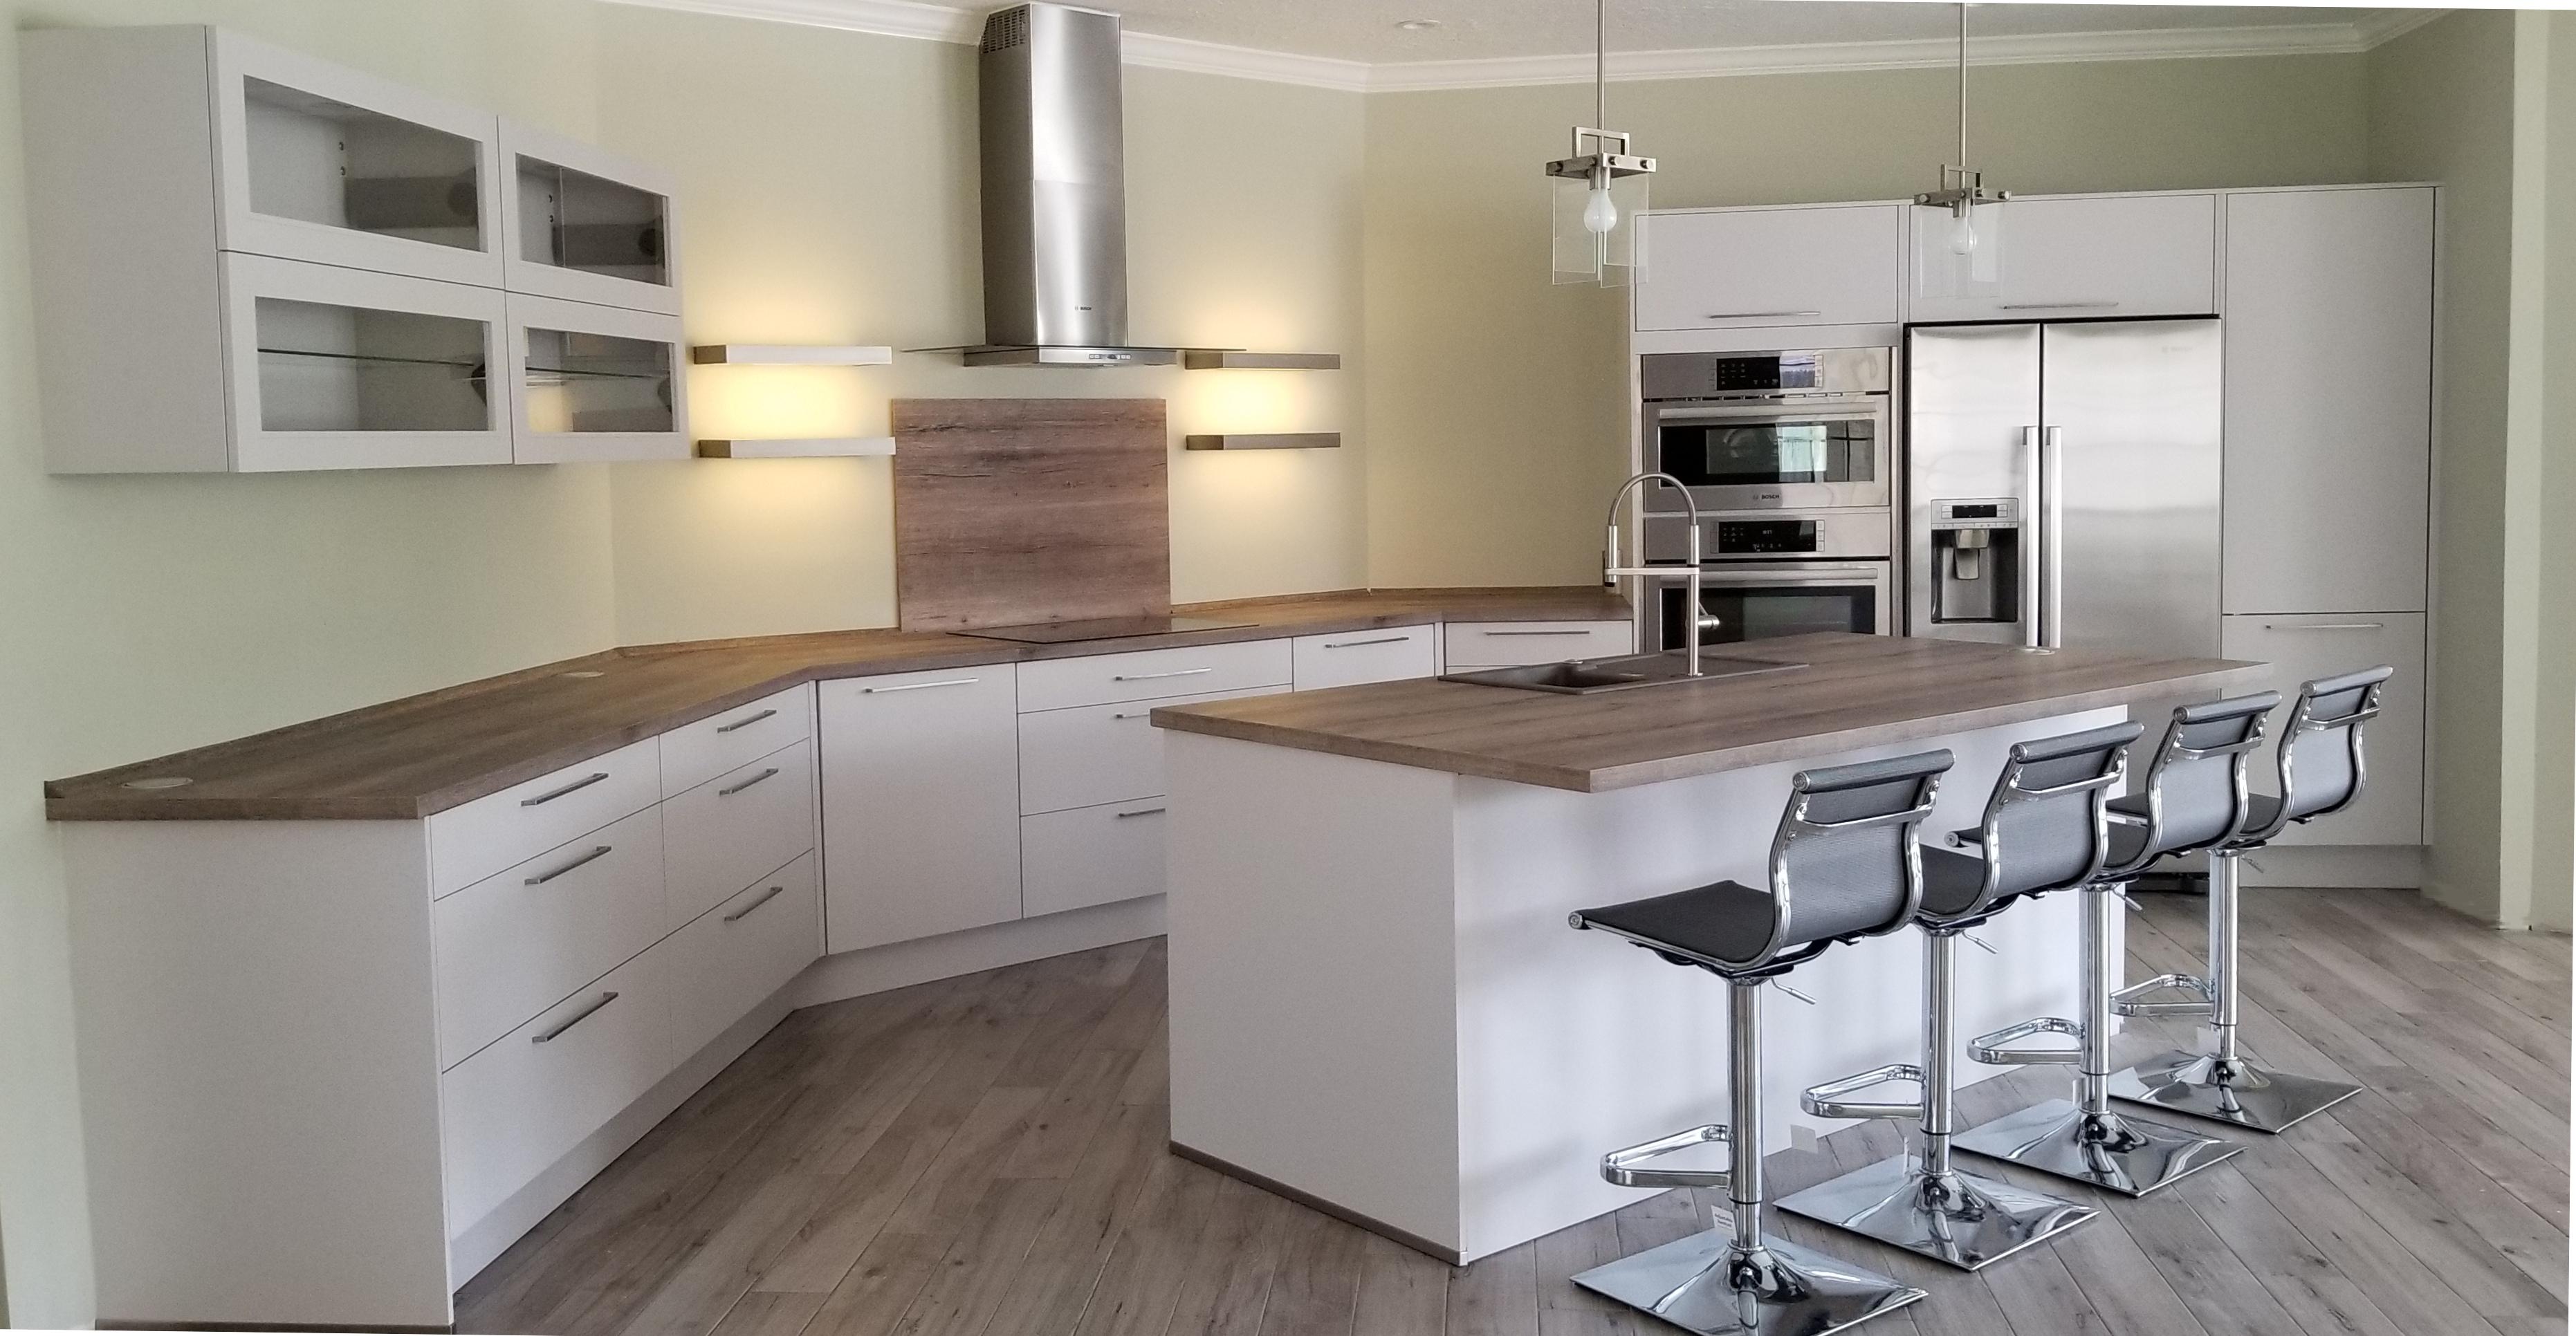 matt finish kitchen cabinets